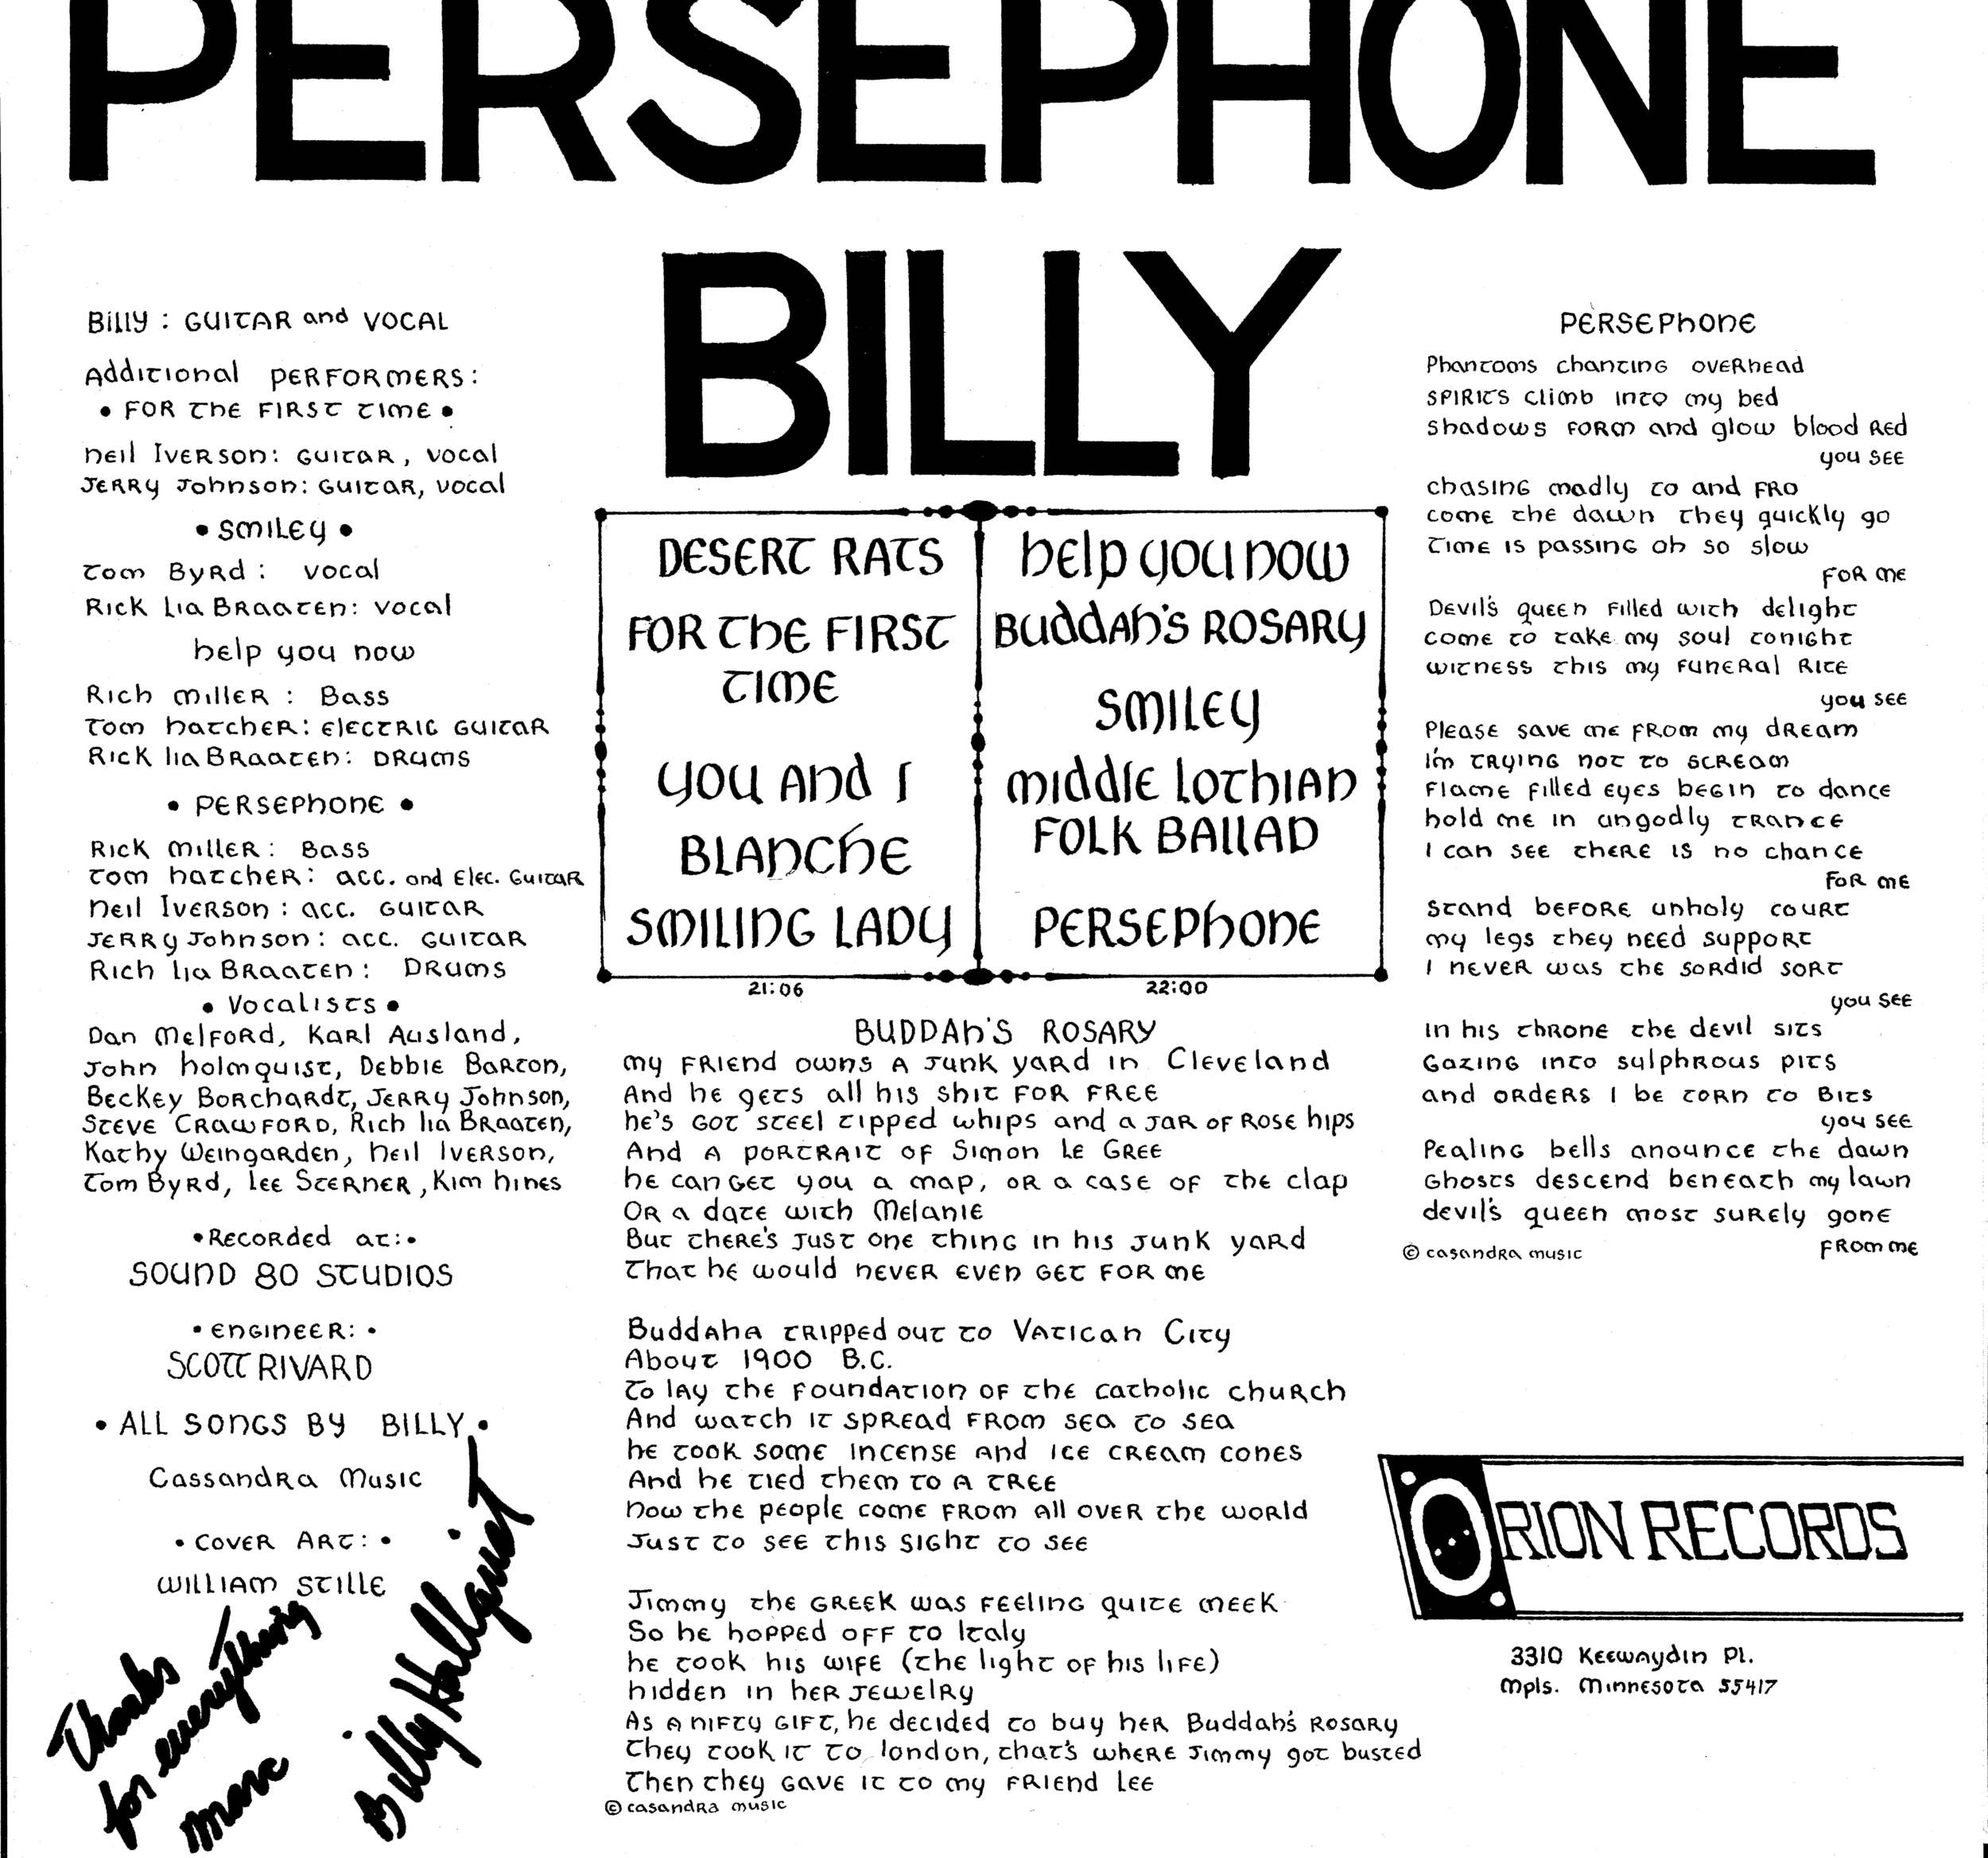 BILLY HALLQUIST - PERSEPHONE - Vinyl Back Cover (1972) With Credits & Lyrics